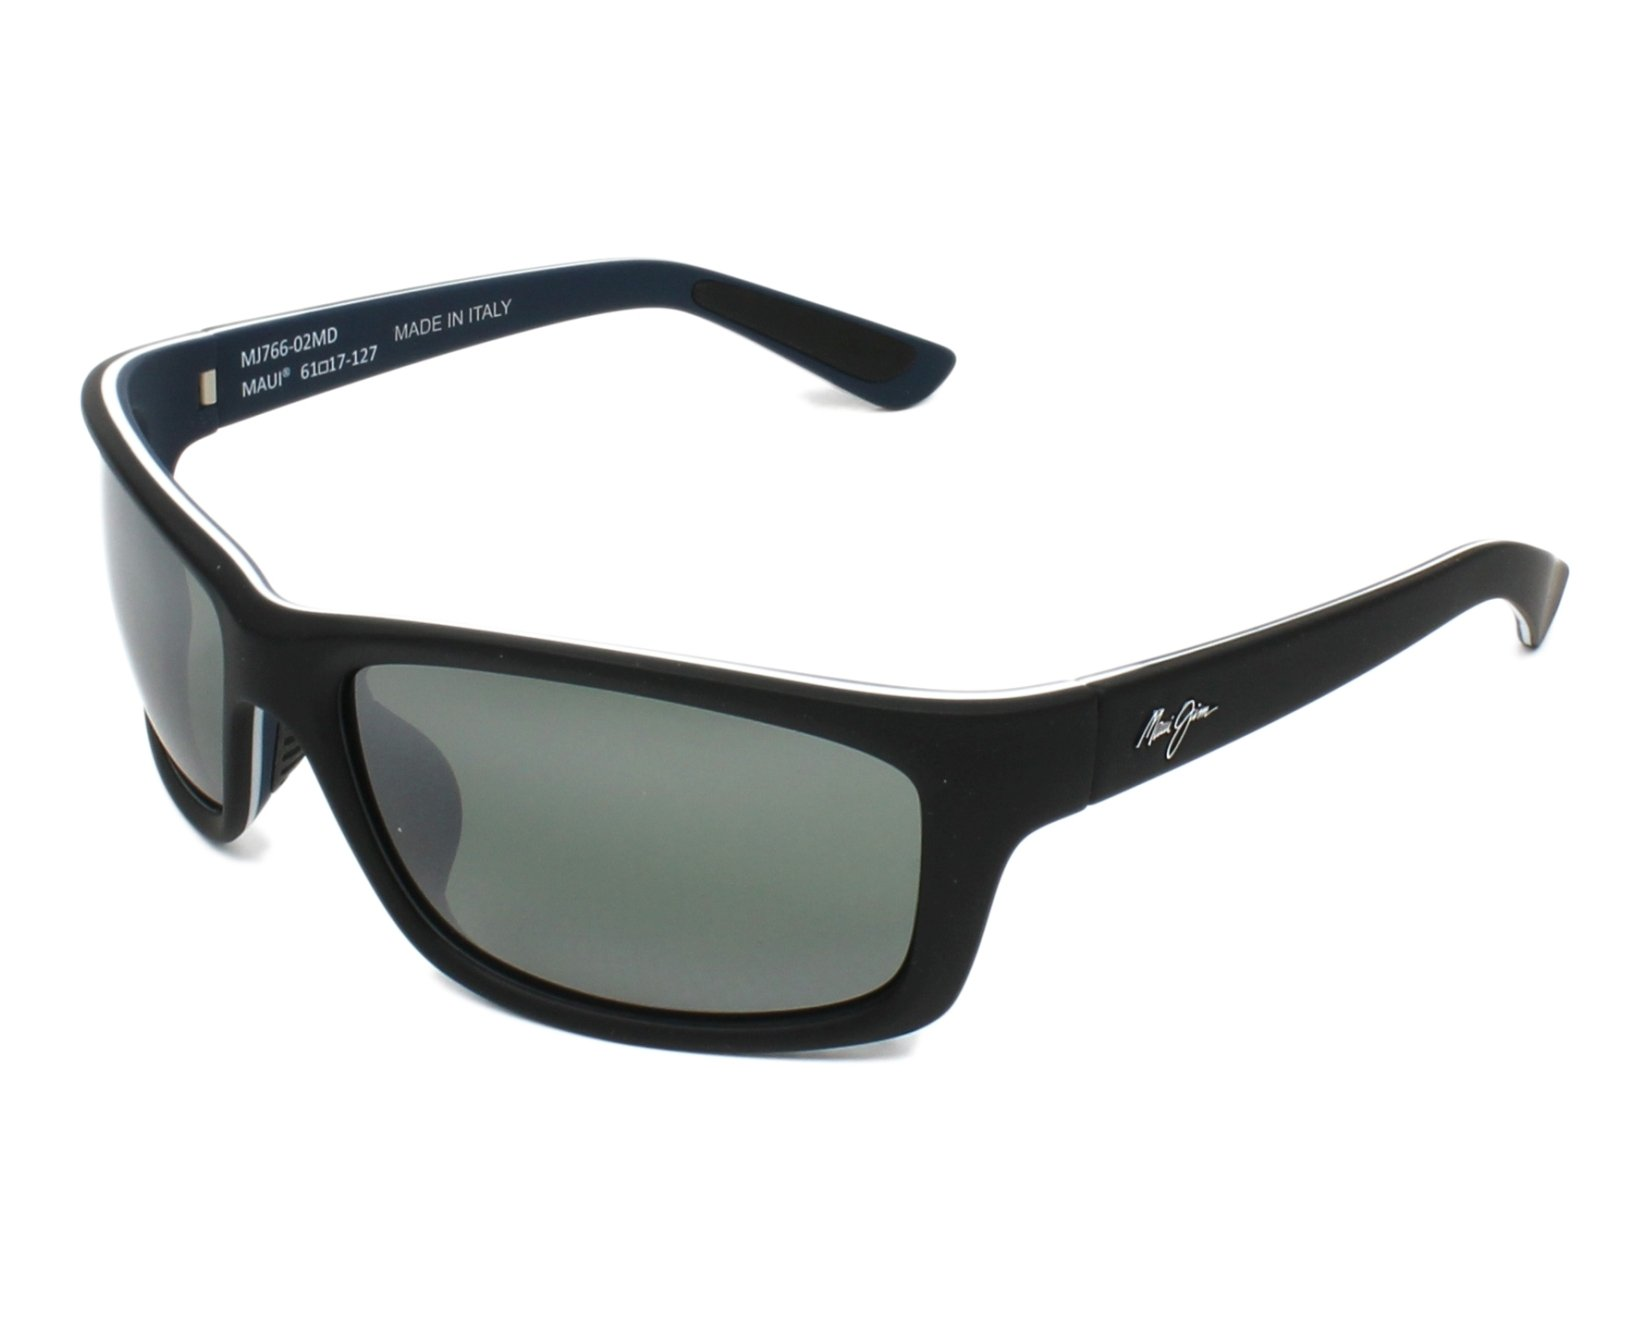 dc3665fb03 Polarized. Sunglasses Maui Jim 766 02MD - Black Blue profile view